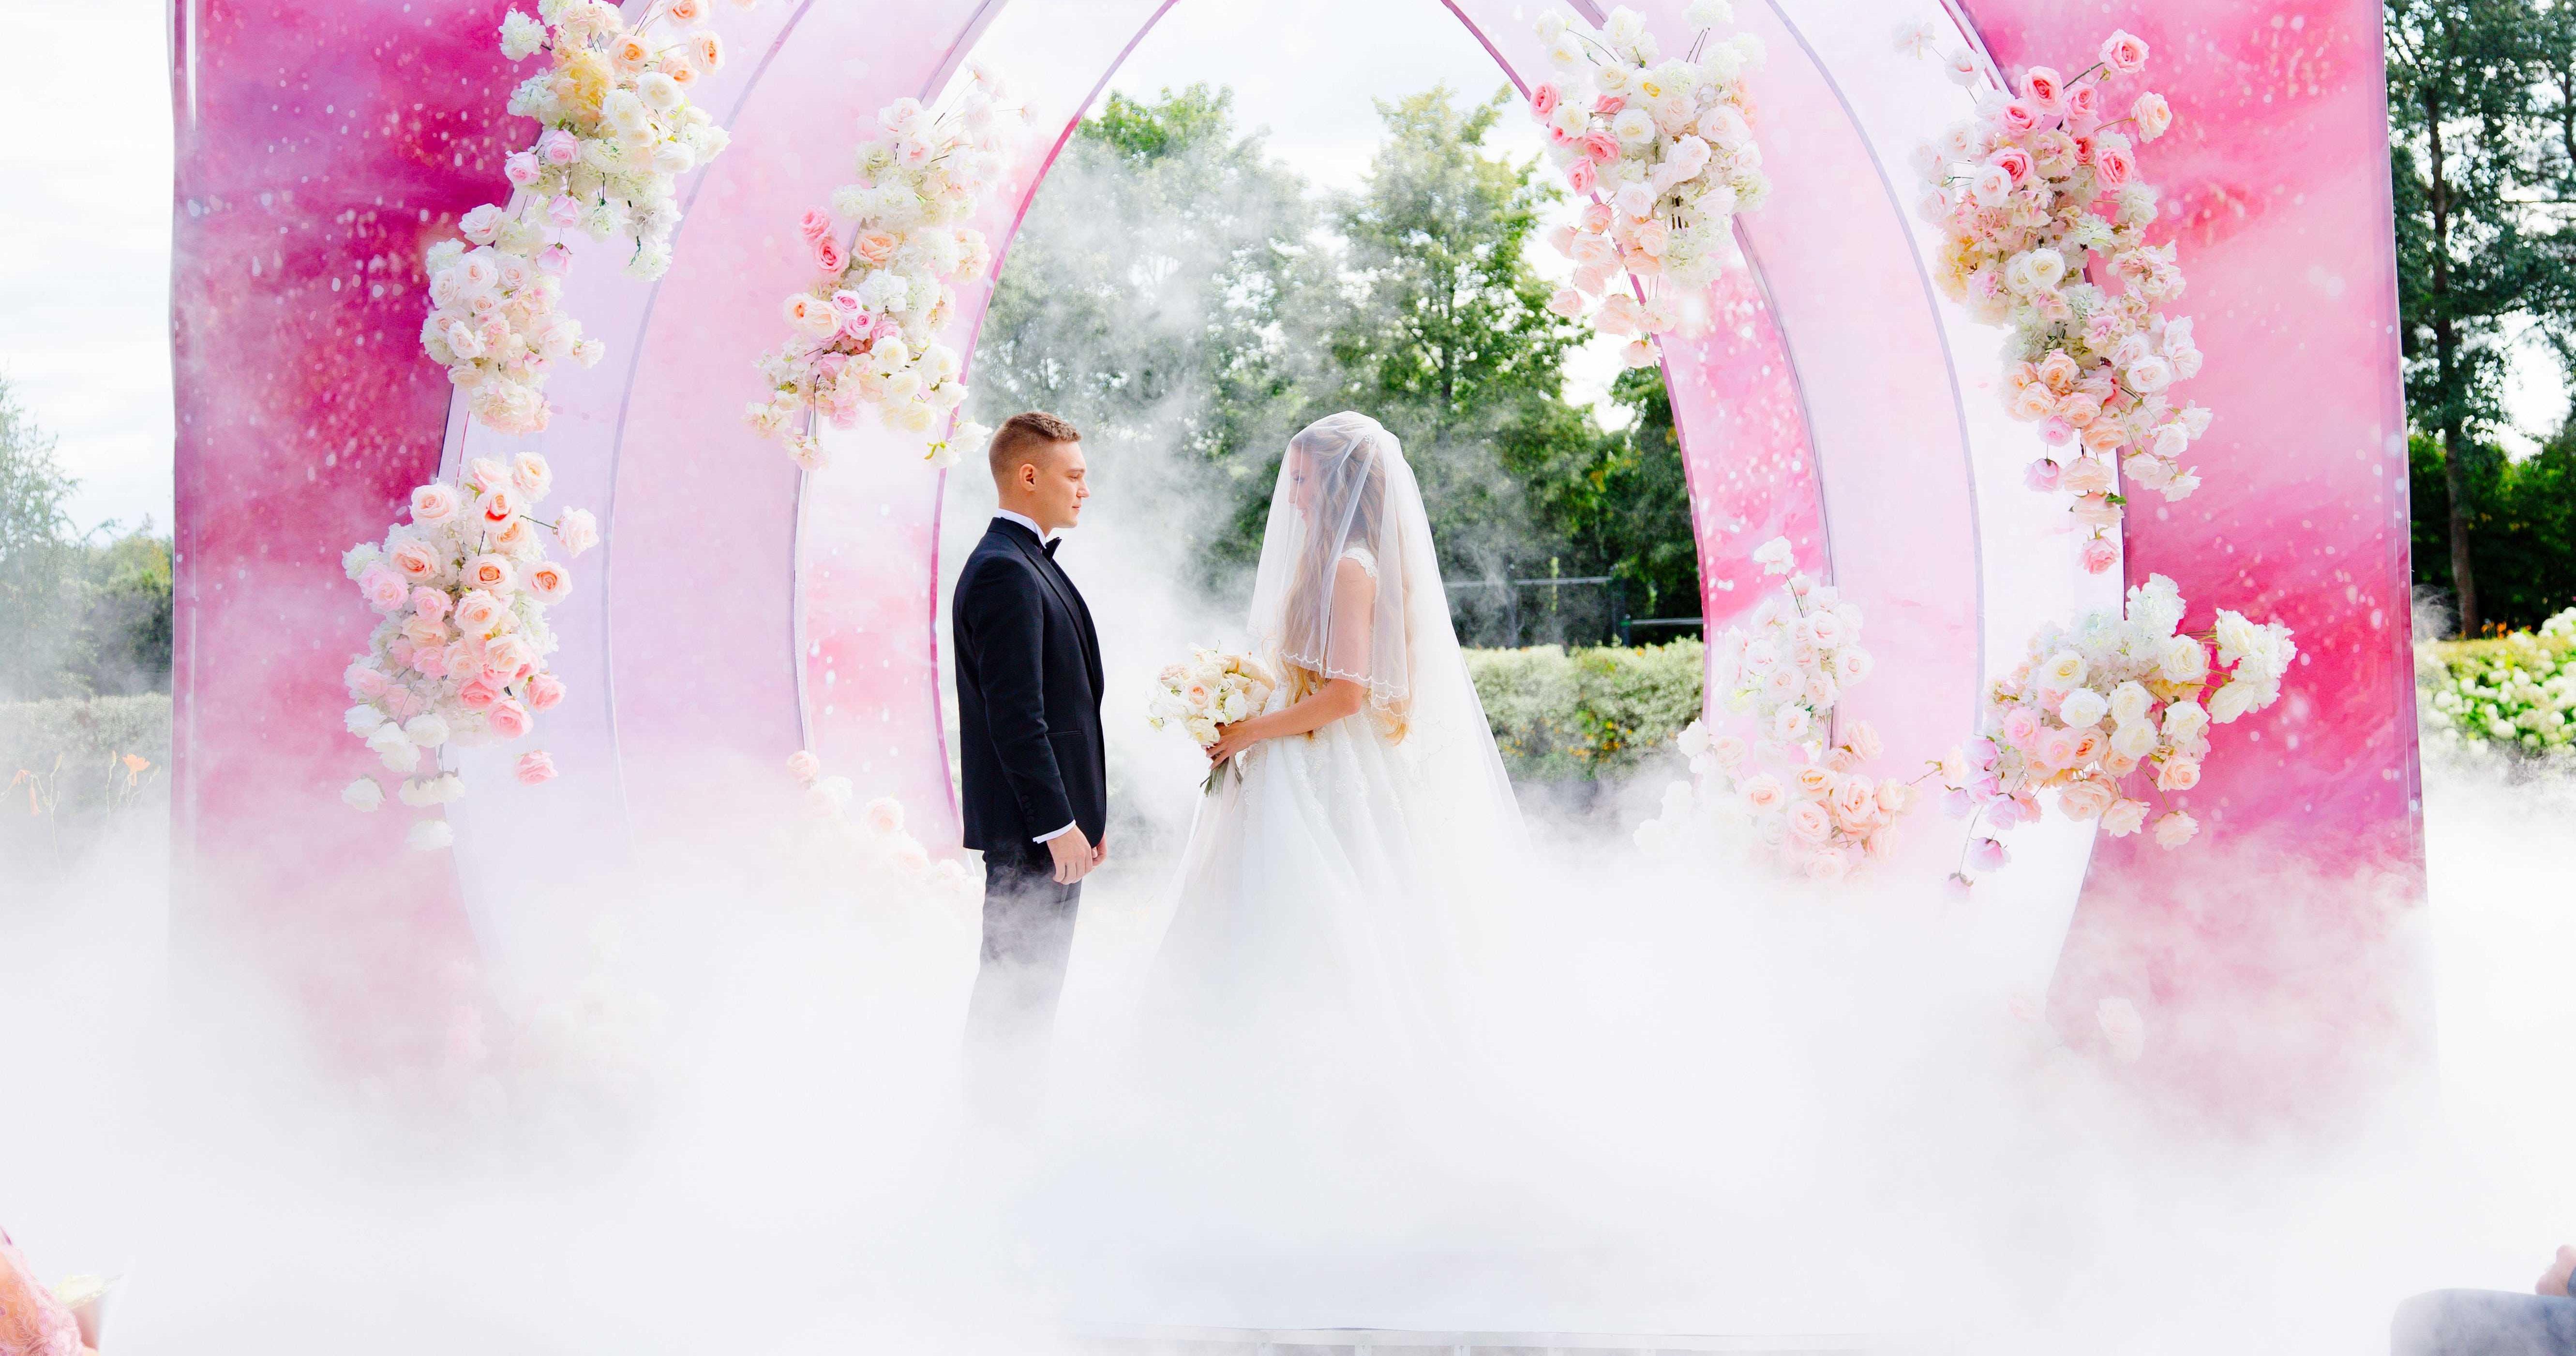 My Breath: нежная свадьба в окружении роз